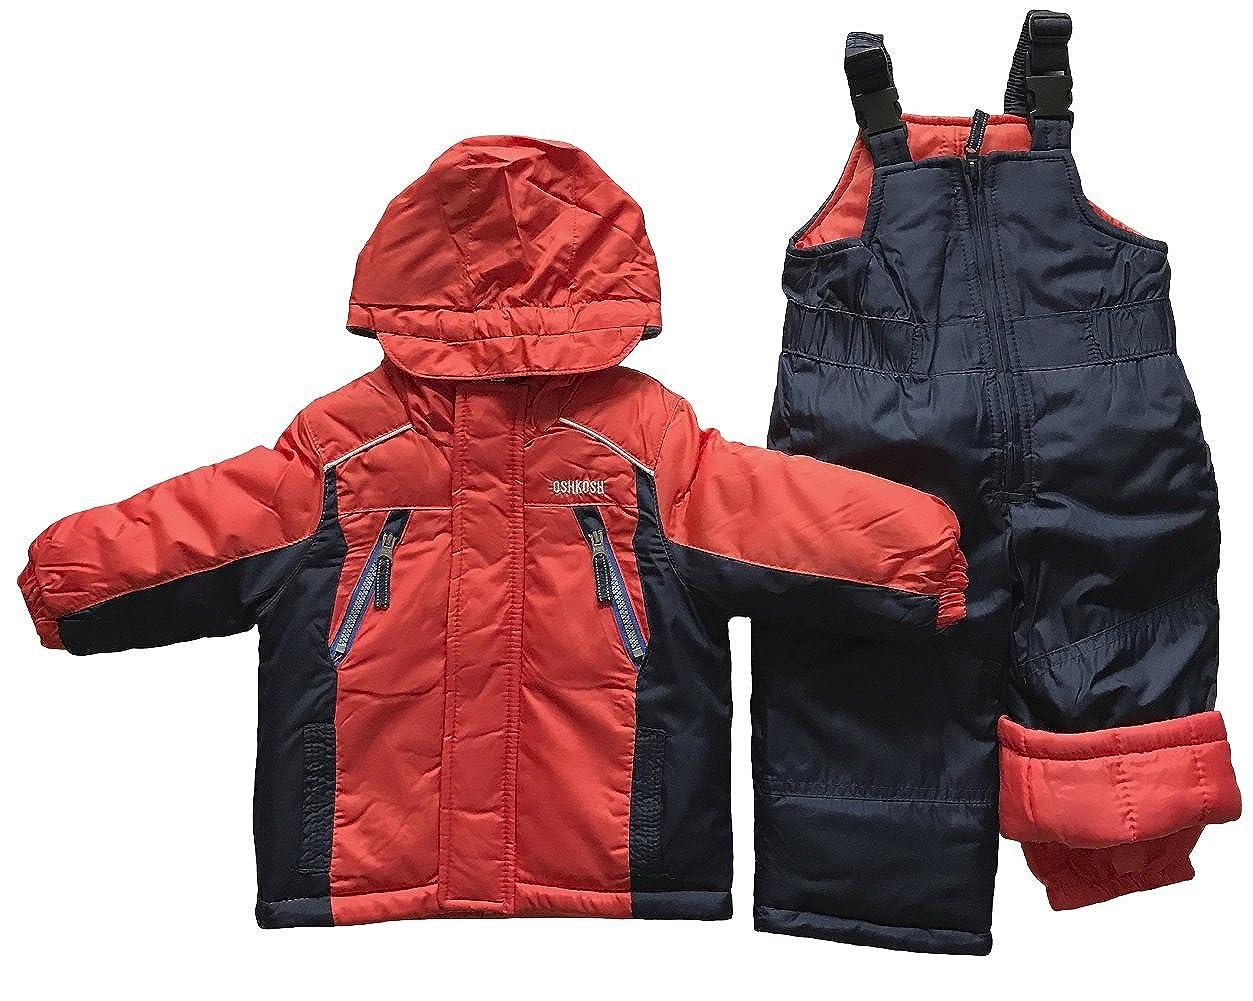 18 Month Oshkosh Shorts Set Professional Design Other Newborn-5t Girls Clothes Baby & Toddler Clothing